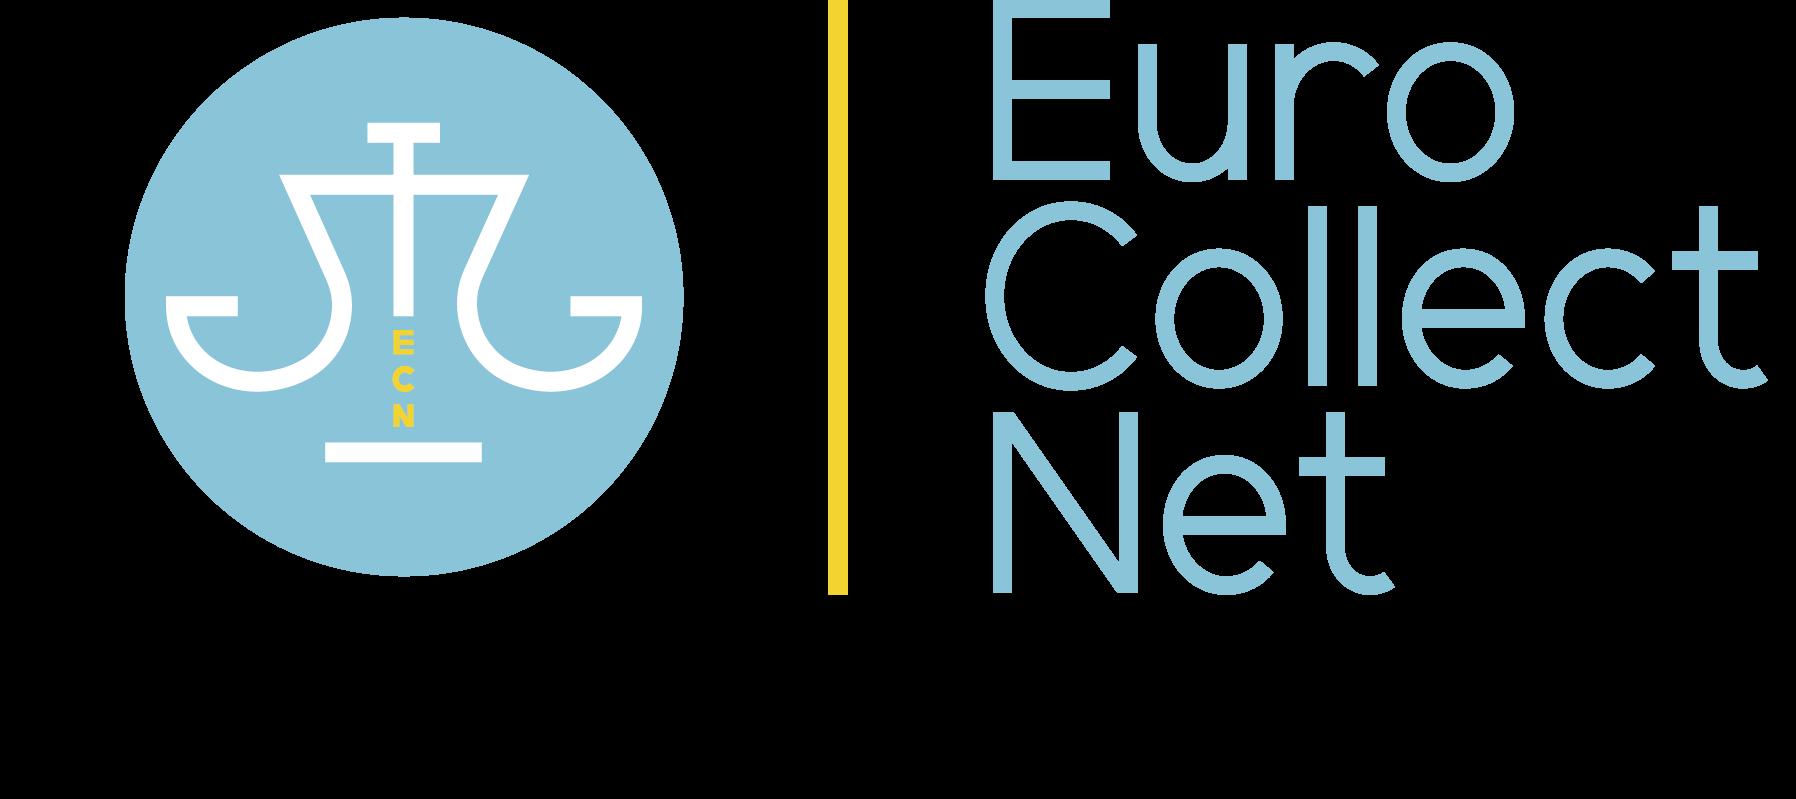 Eurocollectnet